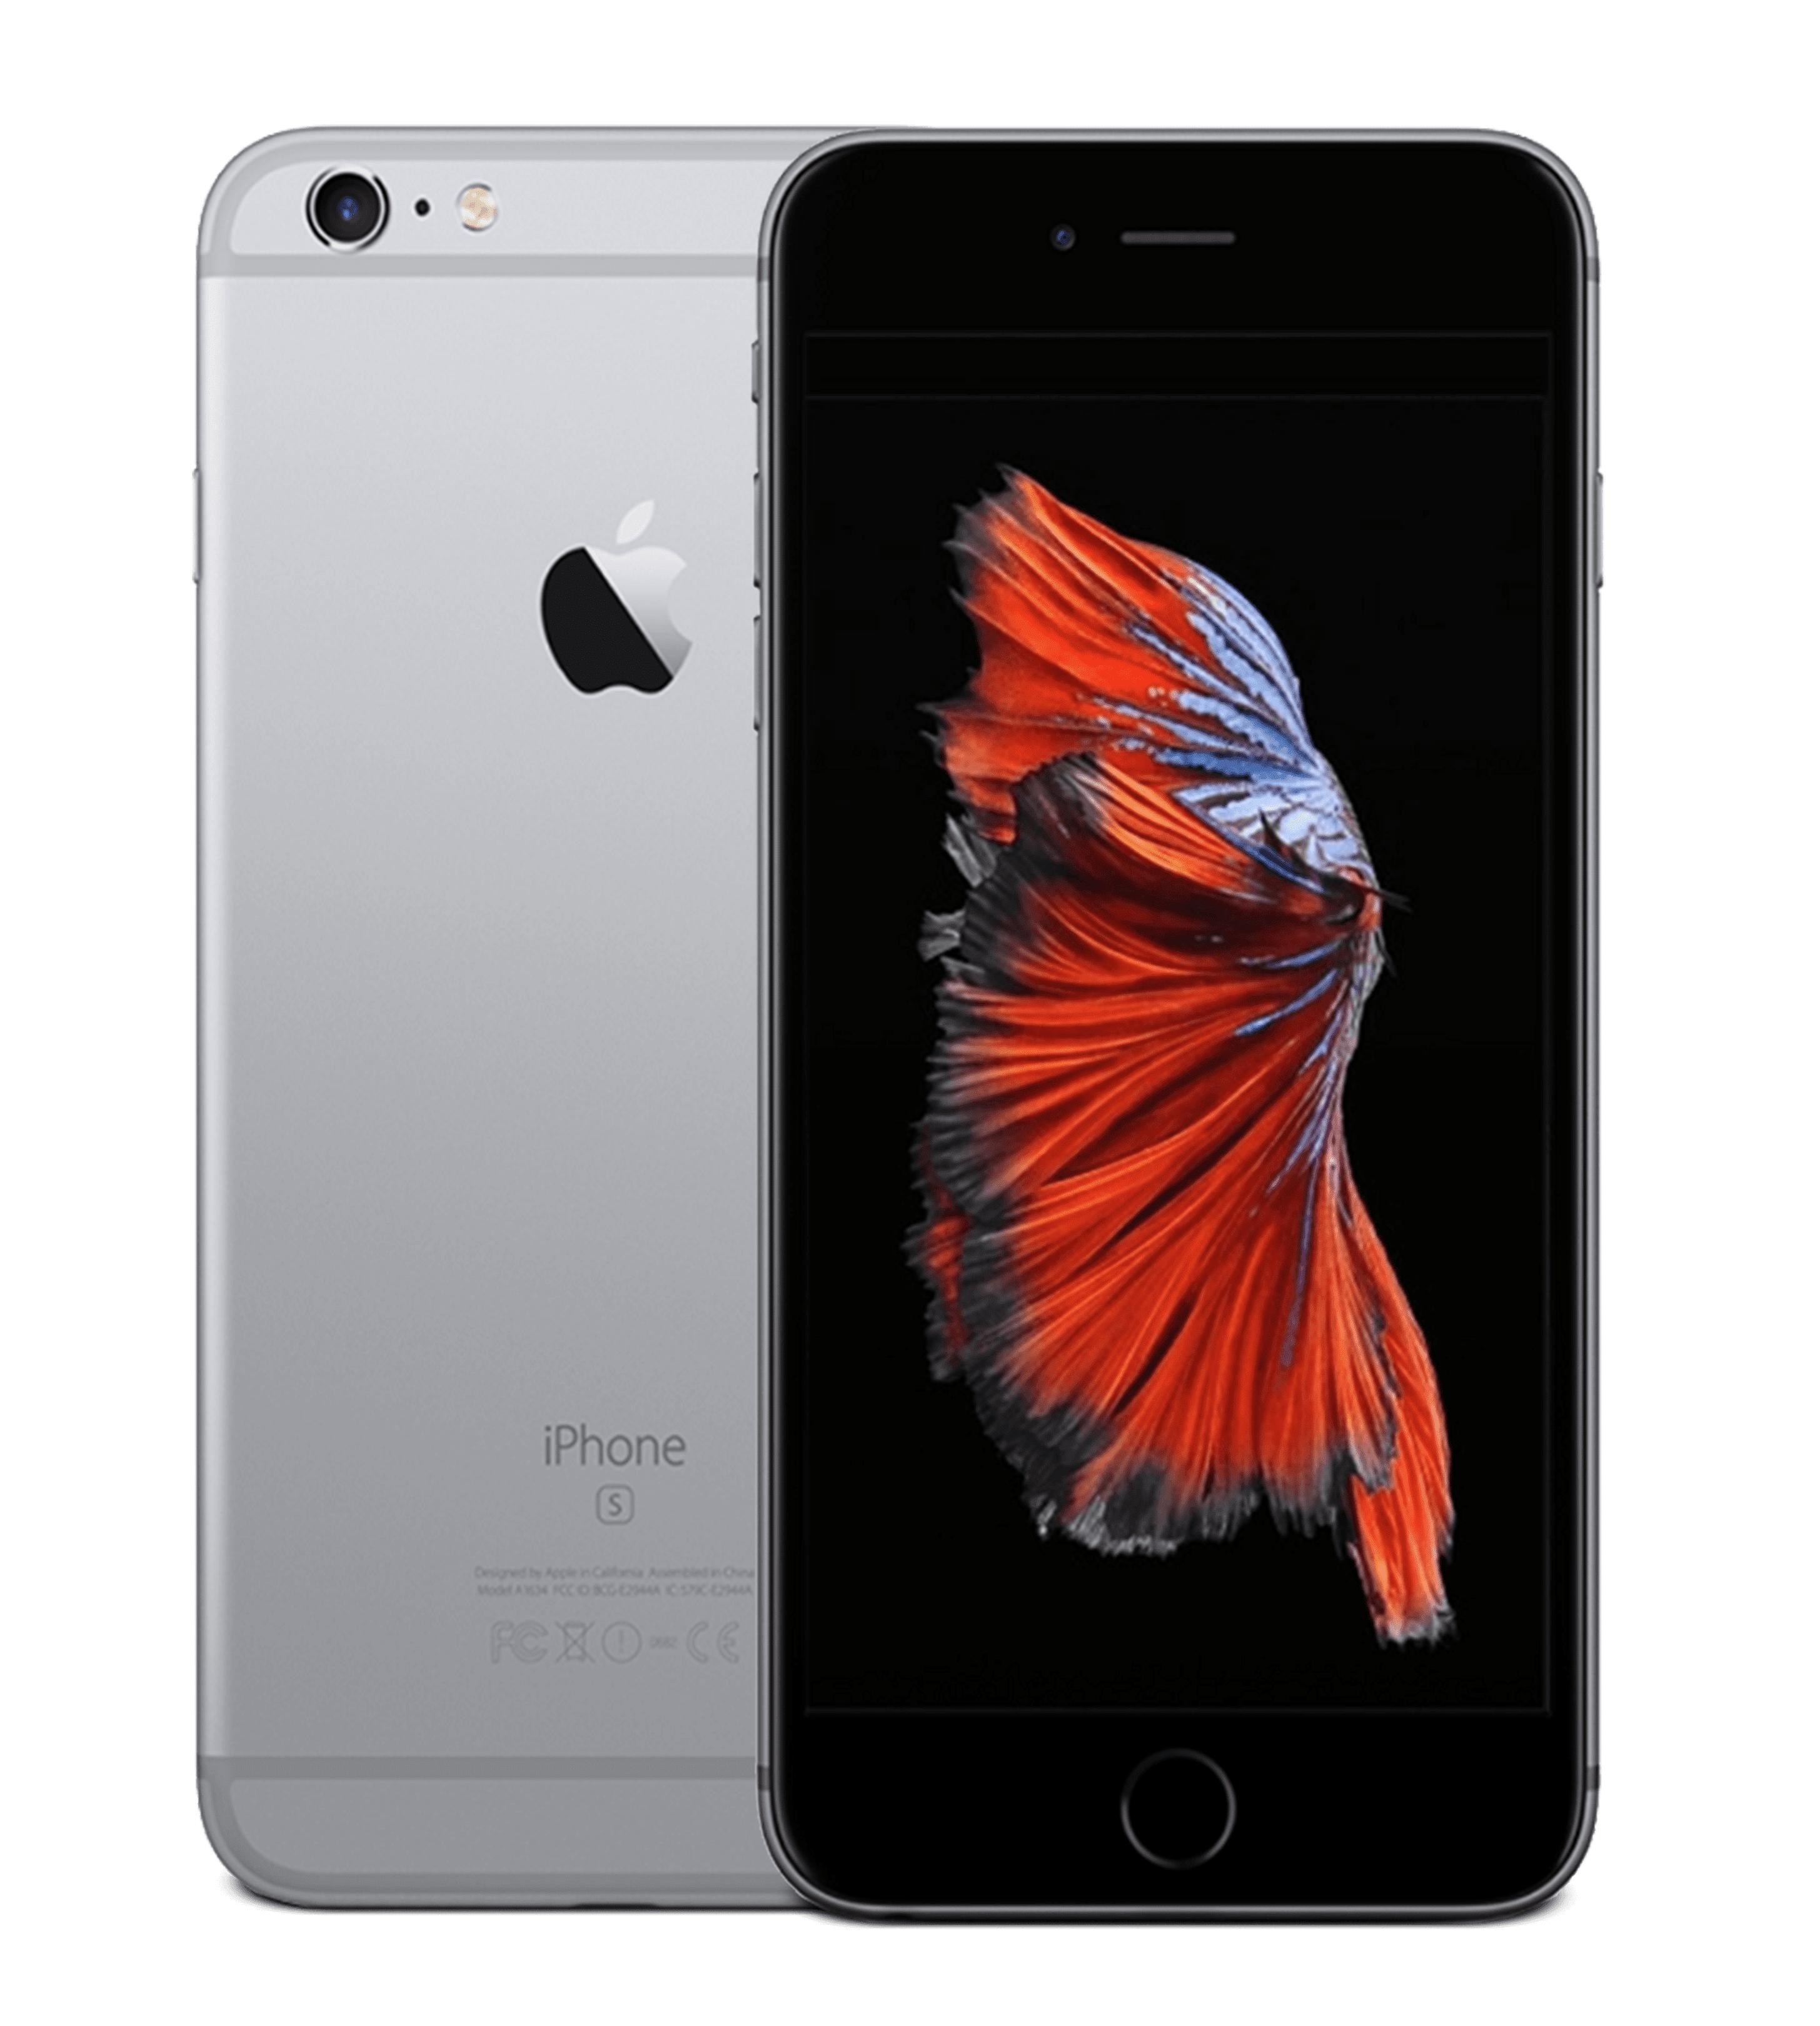 Apple iPhone 6s - COMO NUEVO